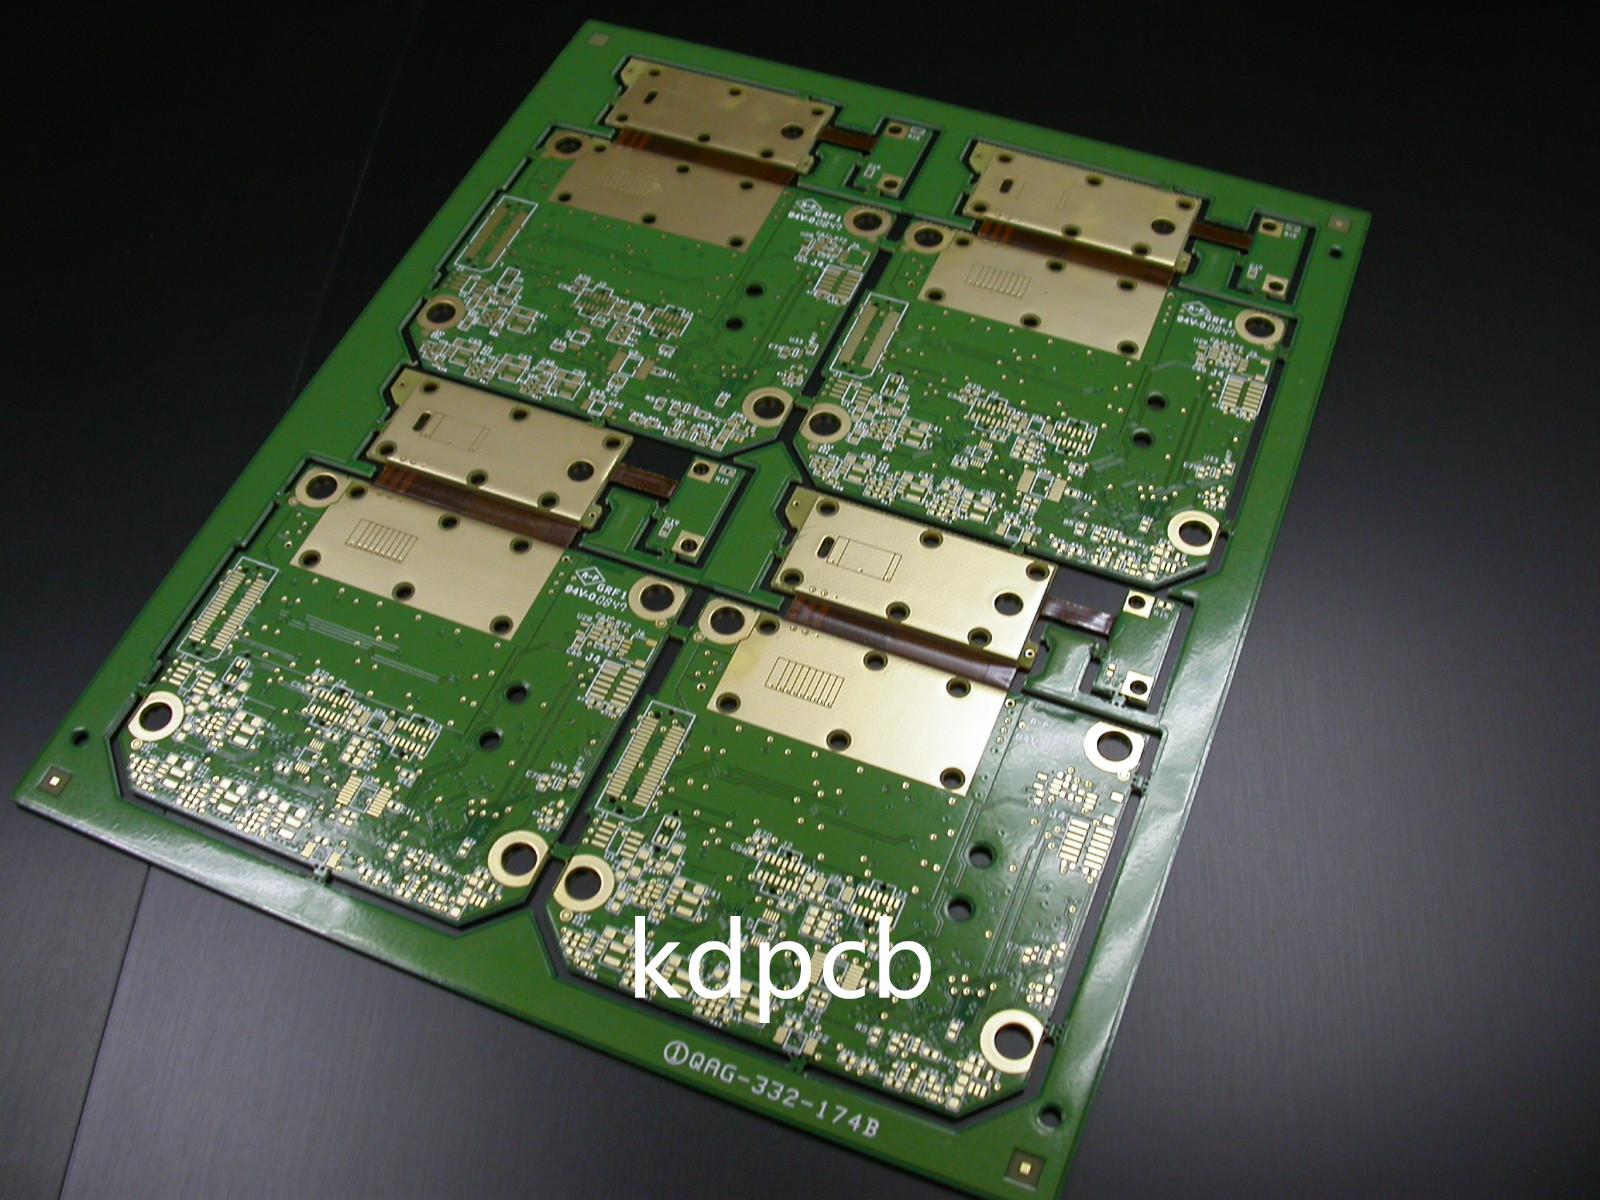 kdpcb products shows the hdi printed circuit boards pcb of kdpcb pcb printed circuit board printed wiring board china pcb hdi [ 1600 x 1200 Pixel ]